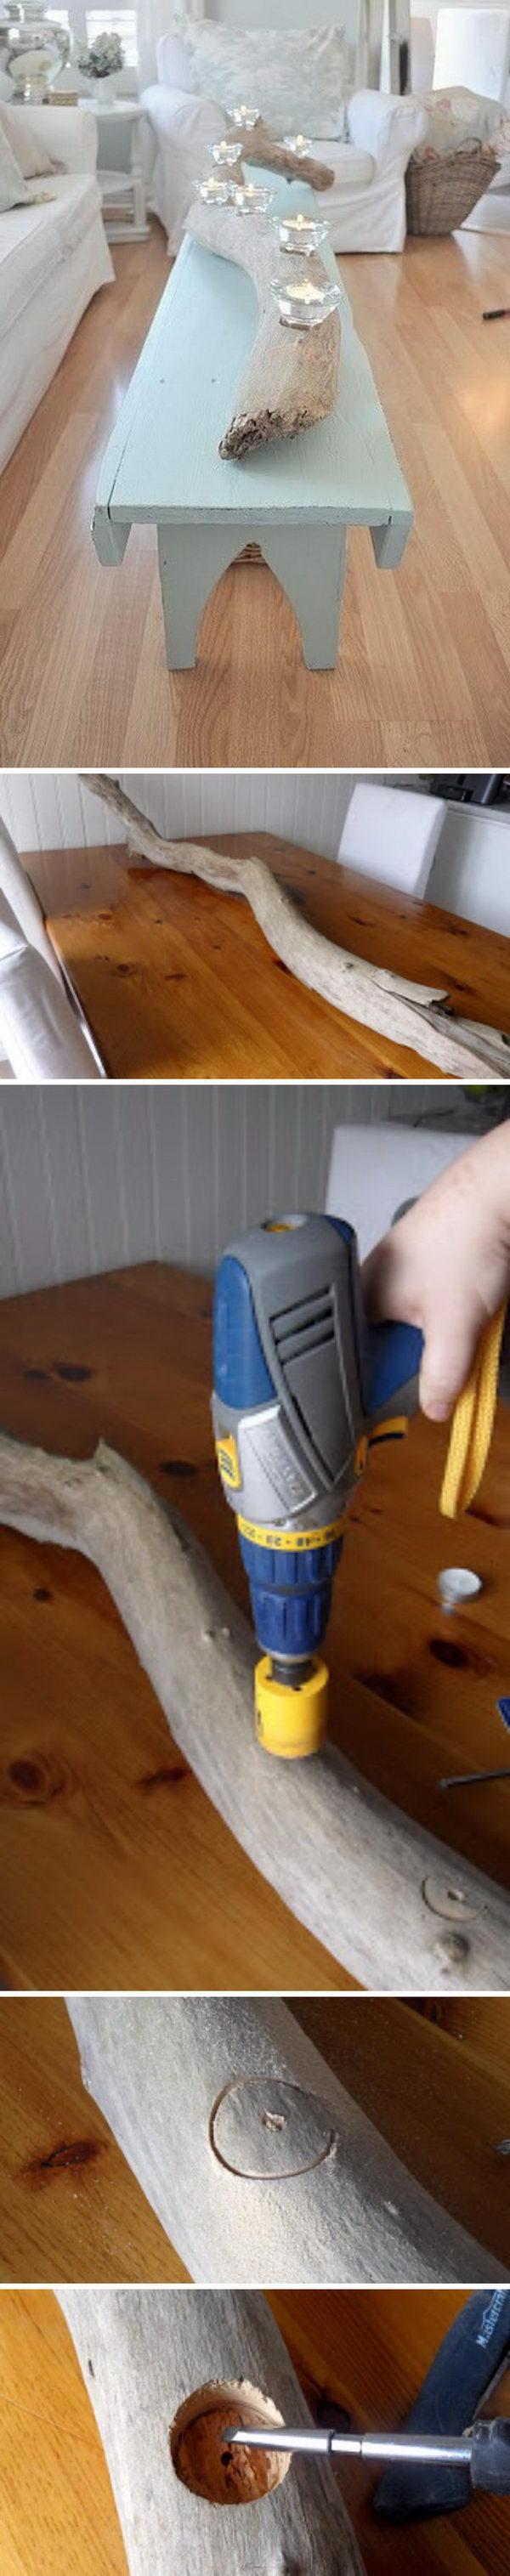 DIY Driftwood Candle Holder.